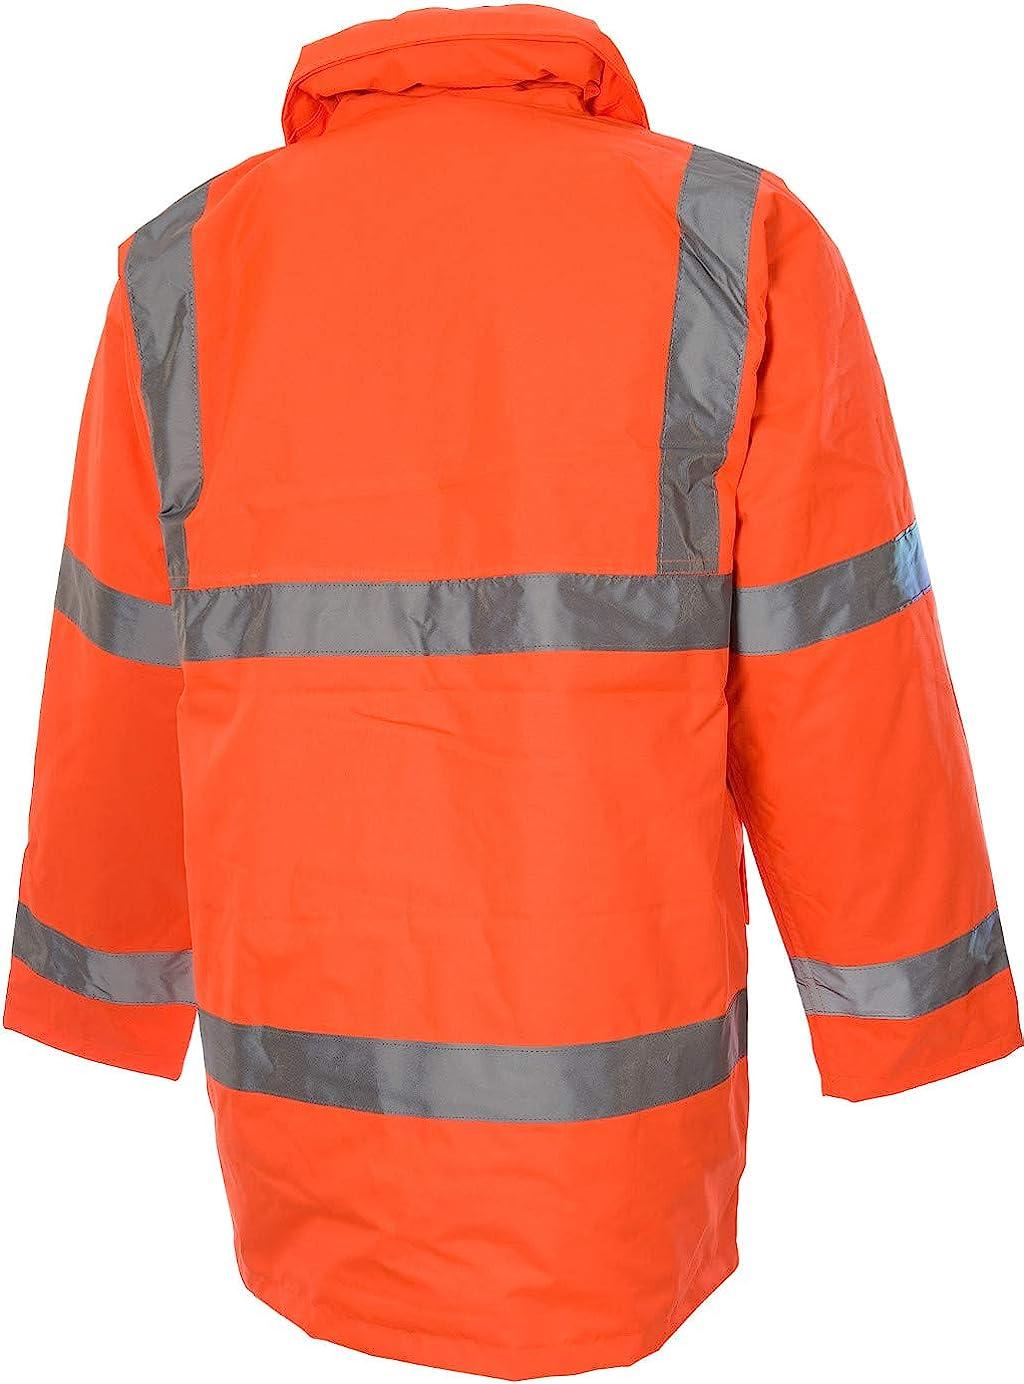 WORKWEAR GUARD ORANGE REFLECTIVE SECURITY ORANGE HI VIS PARKA JACKET HI VIZ